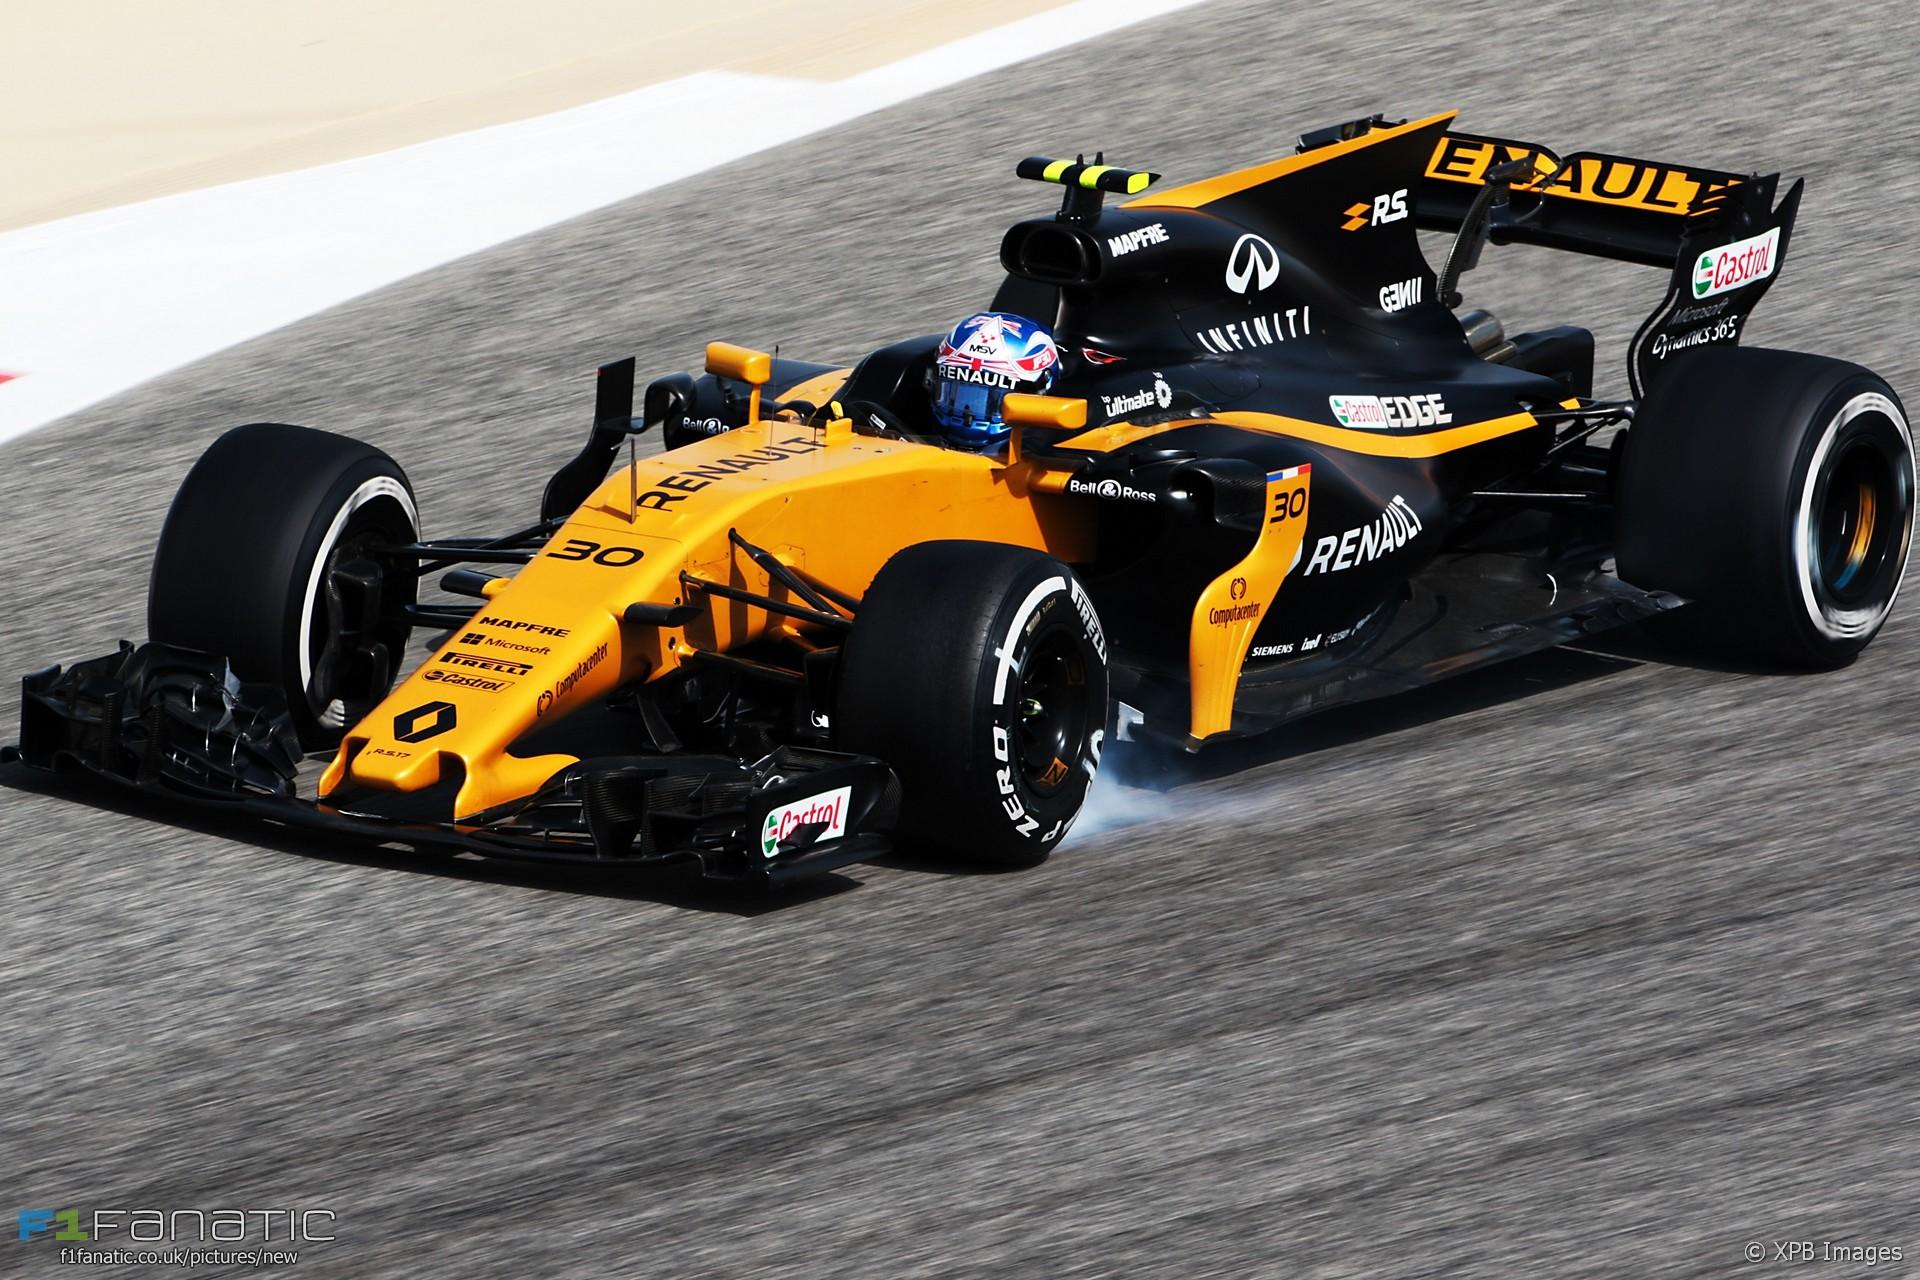 formula 1 next race